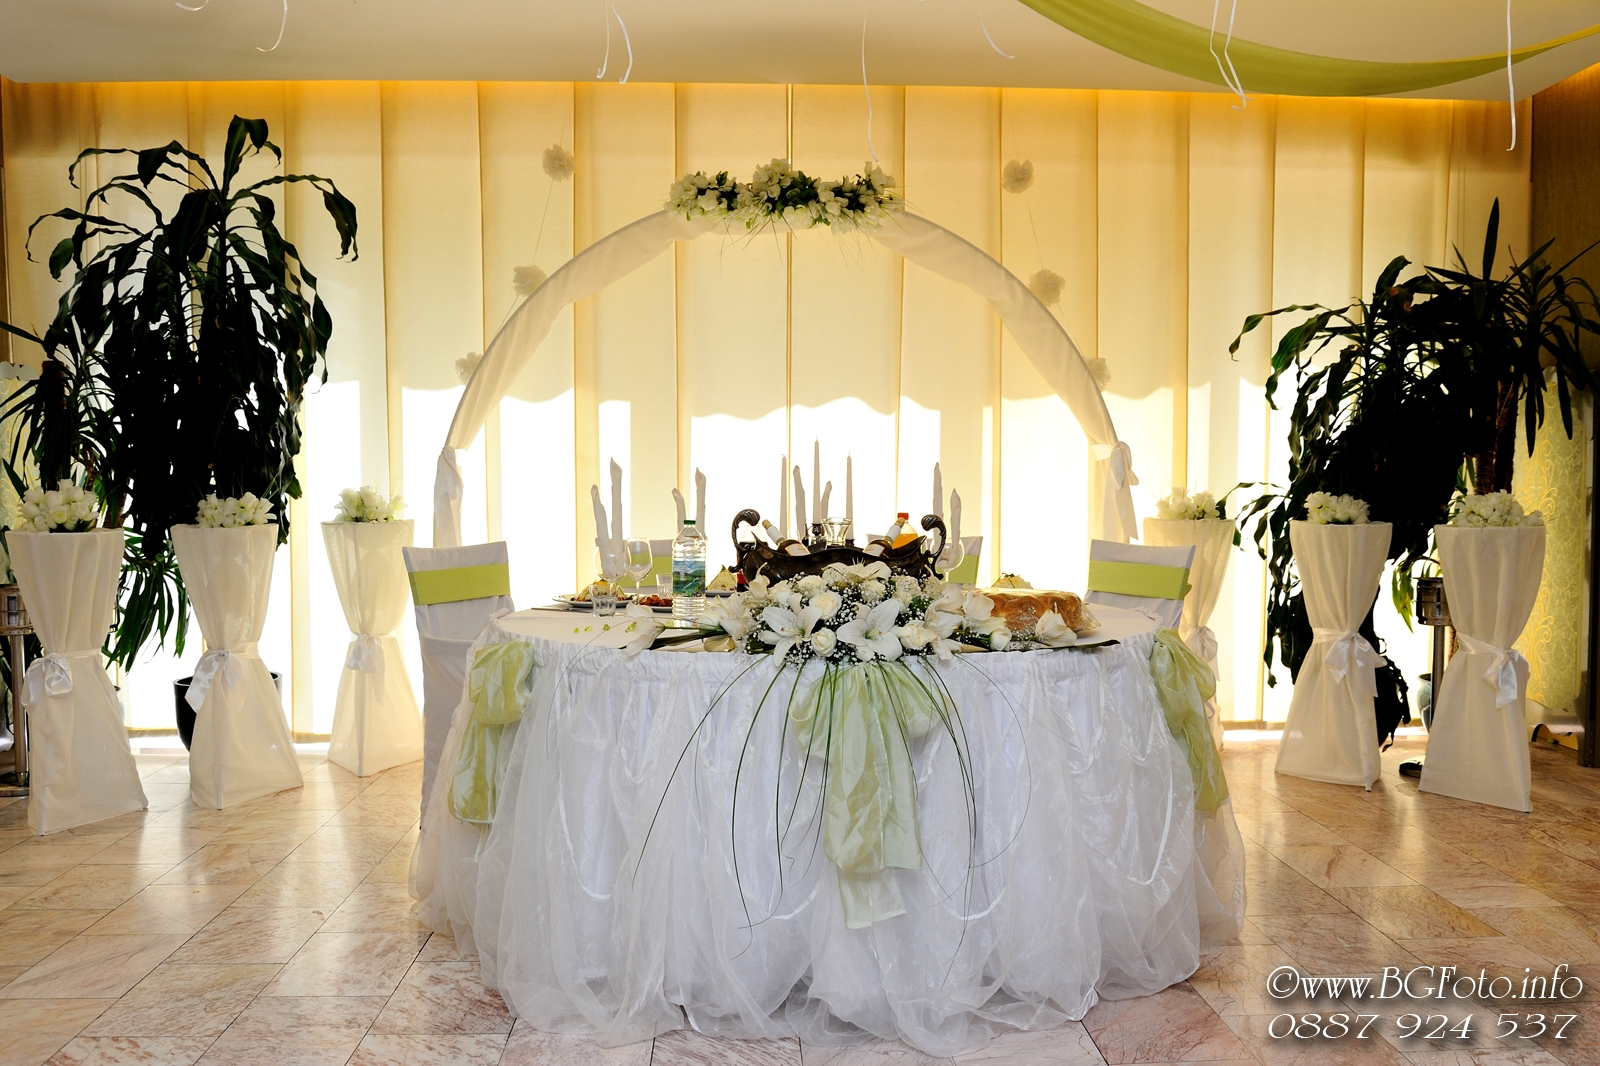 Ресторант за сватби - PRINCIPI DI PIEMONTE - Интерпред